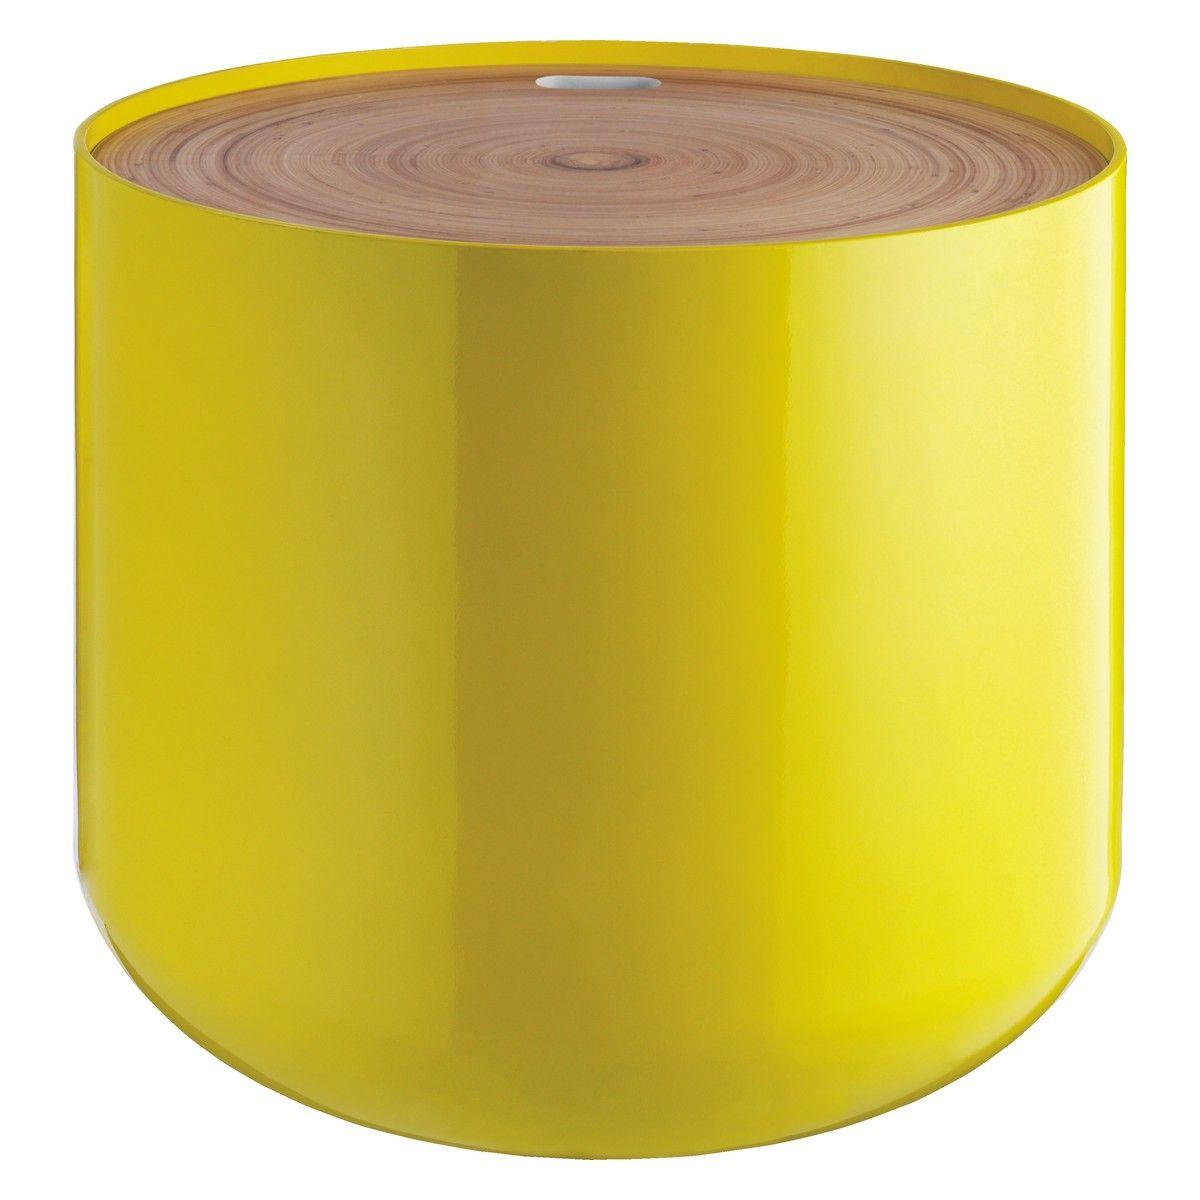 Side Tables With Storage blyth yellow storage side table | yellow storage, storage and clutter